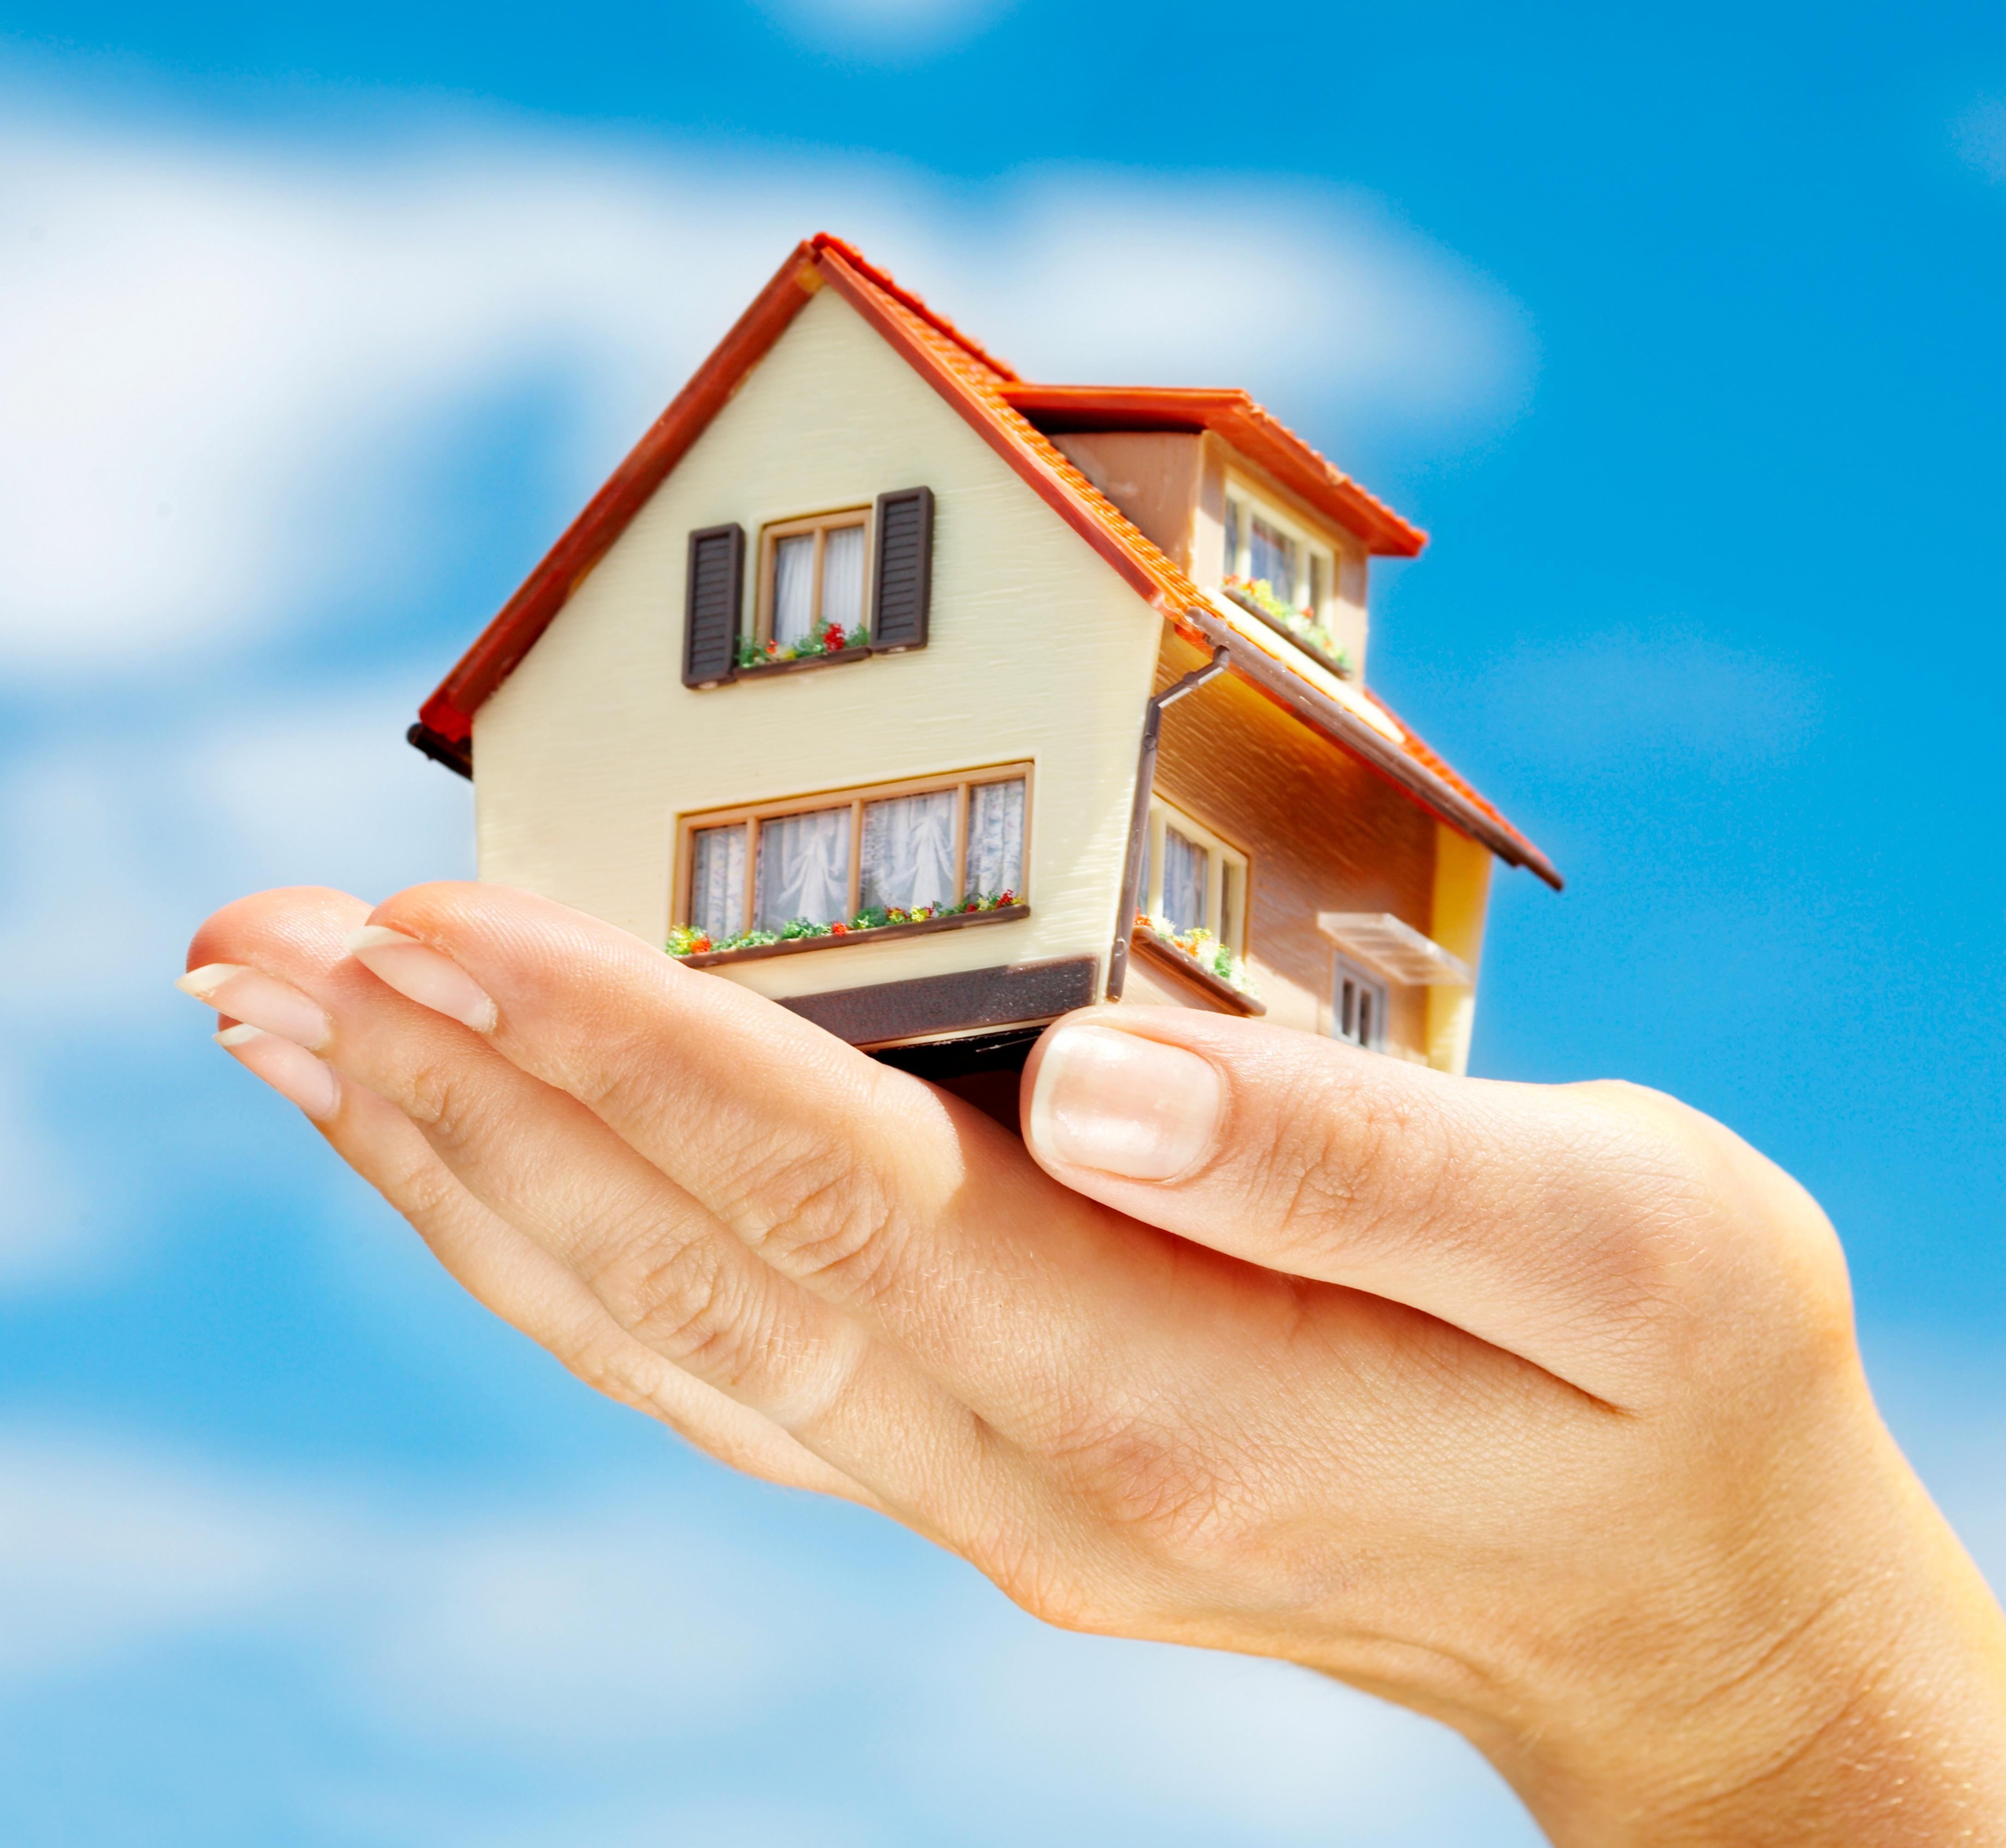 Займ под материнский капитал на покупку дома за